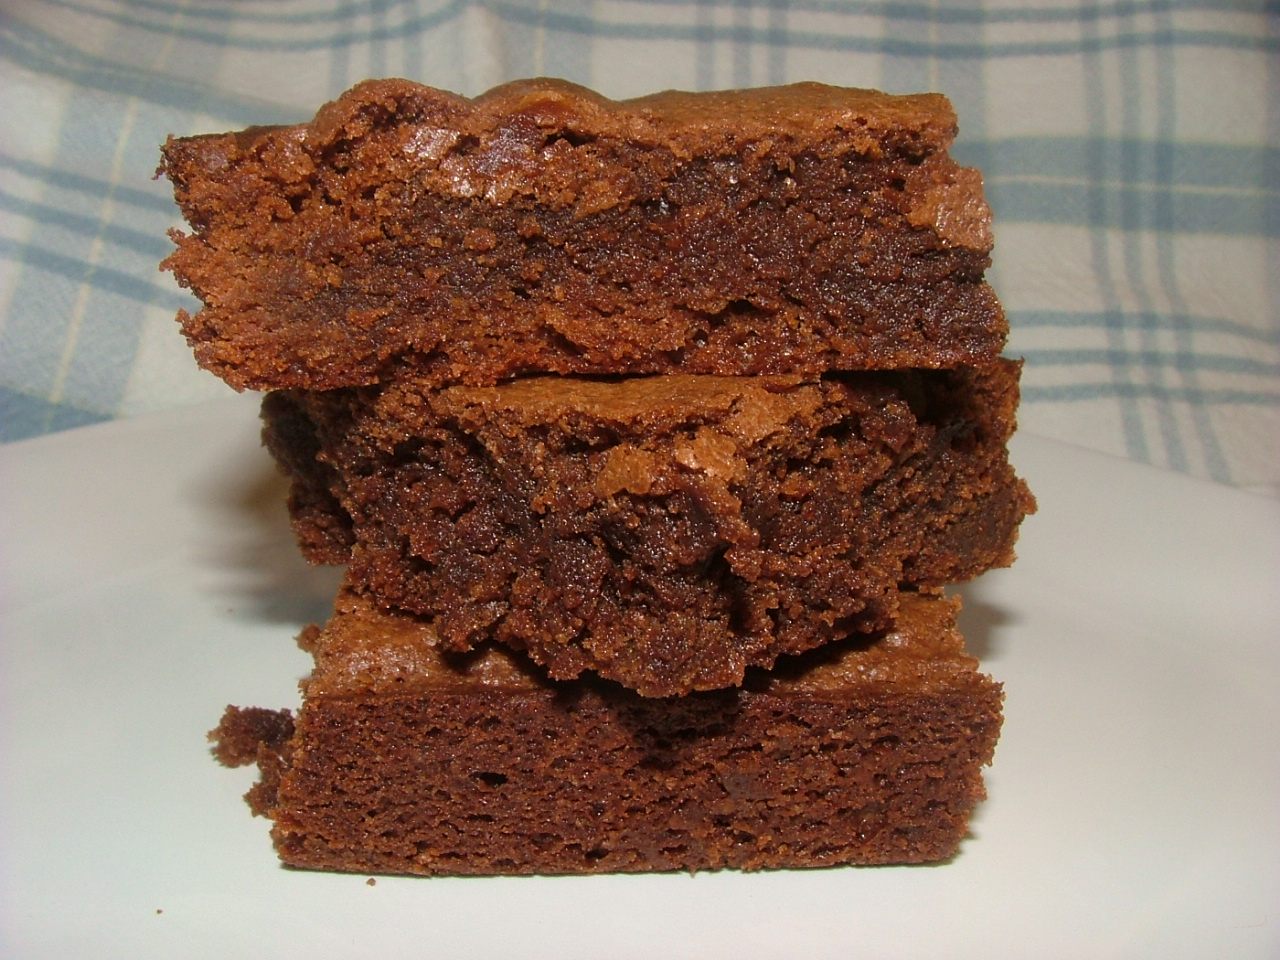 Chocolate Lovers Deluxe Fudgy Brownies